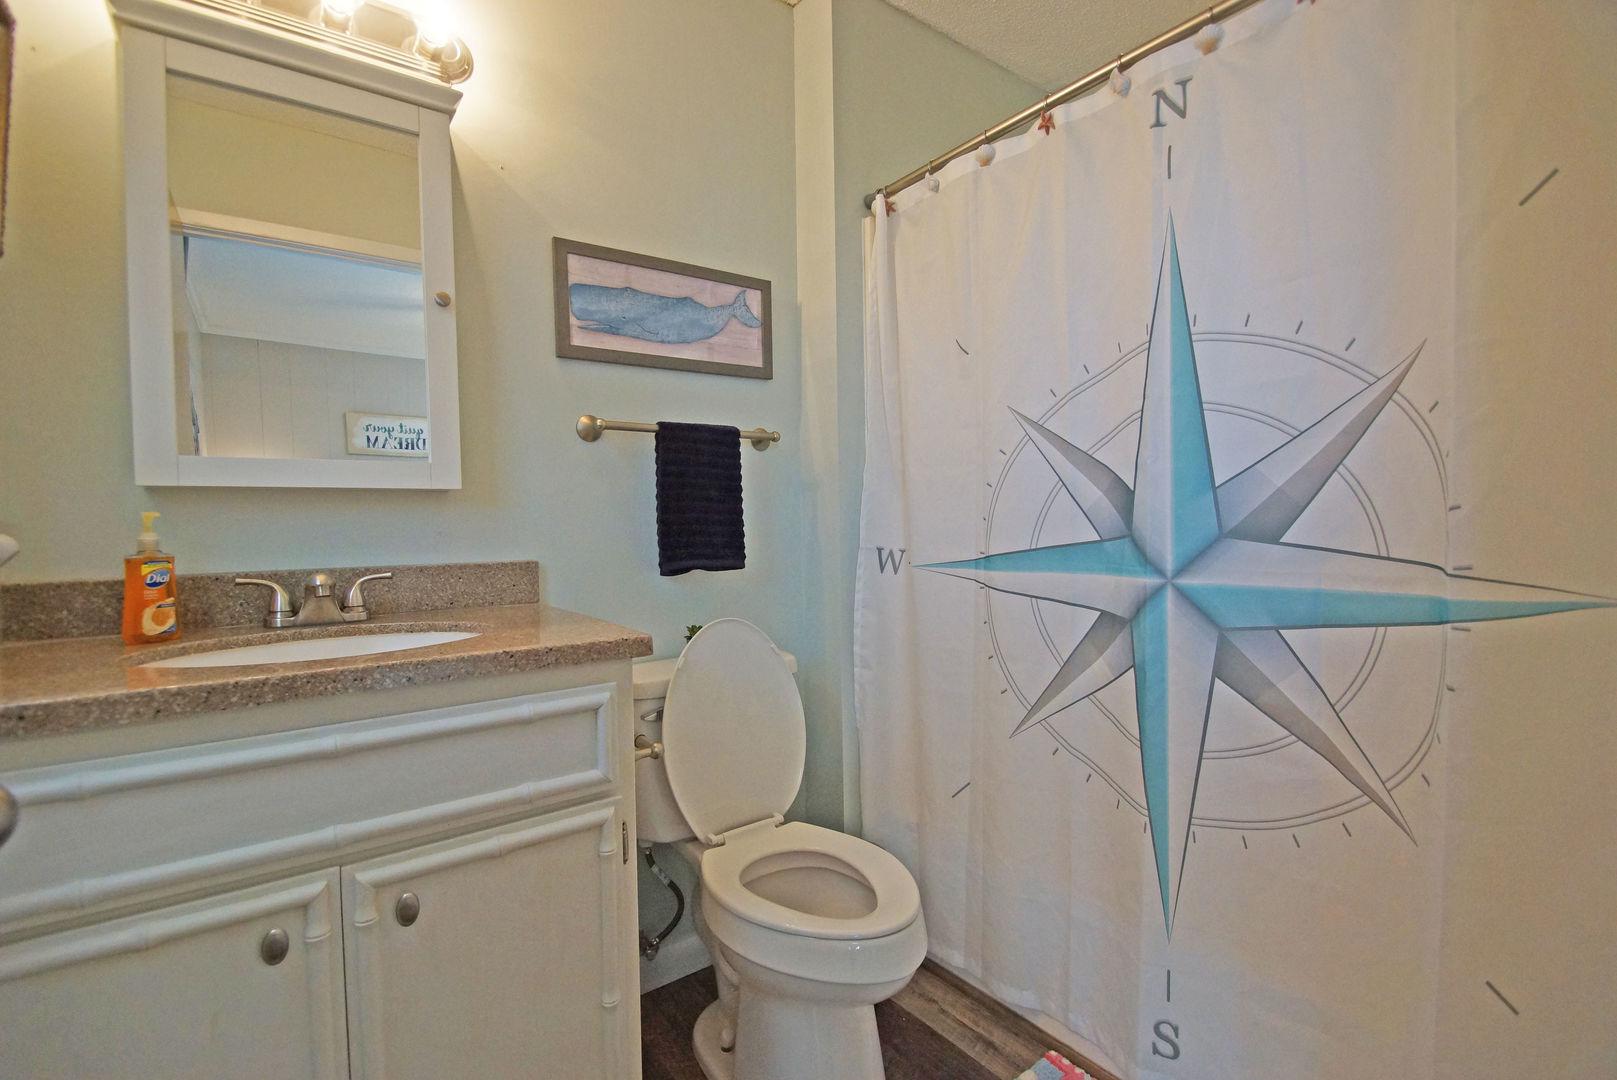 Single Vanity Sink, Toilet, Mirror, and Shower.